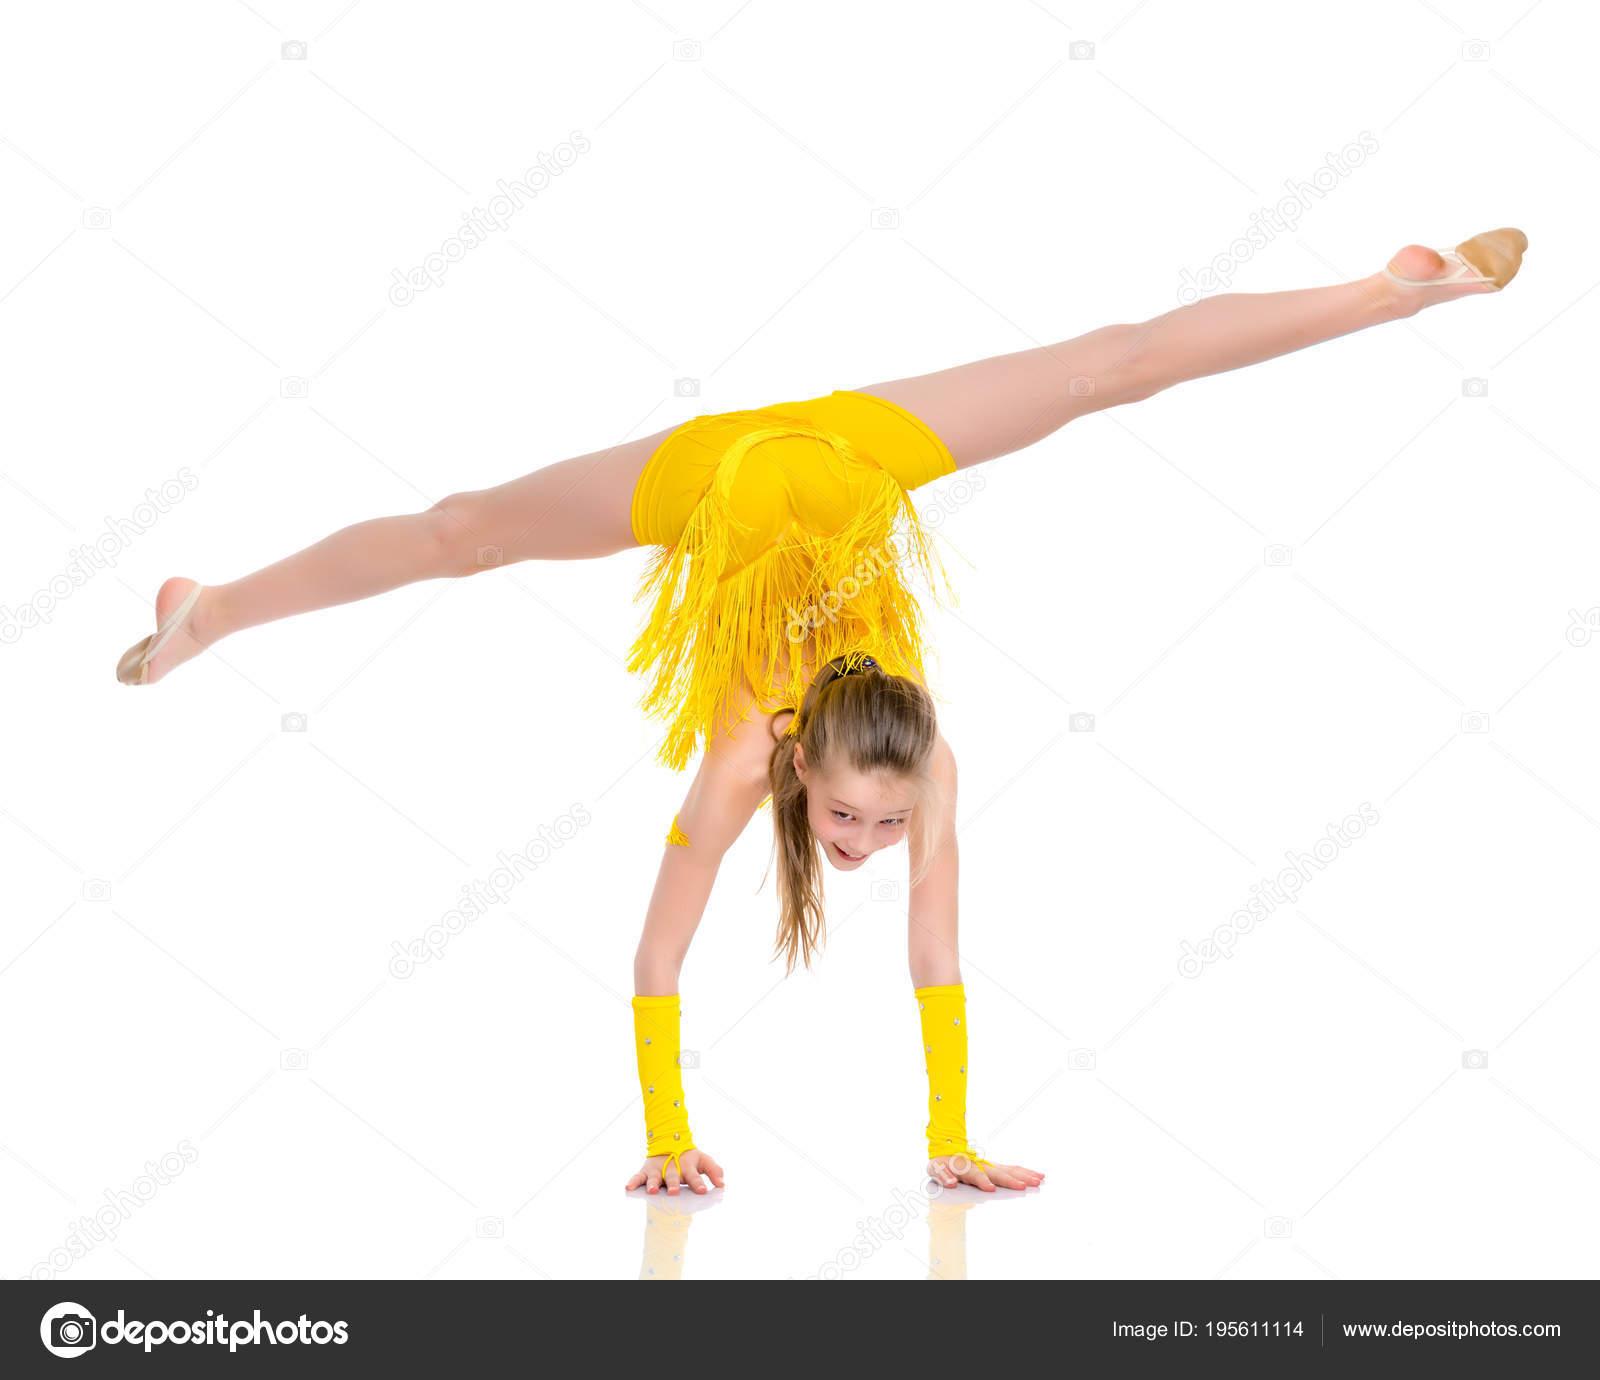 akrobati-gimnastki-foto-viktoriya-tiffani-pornoaktrisa